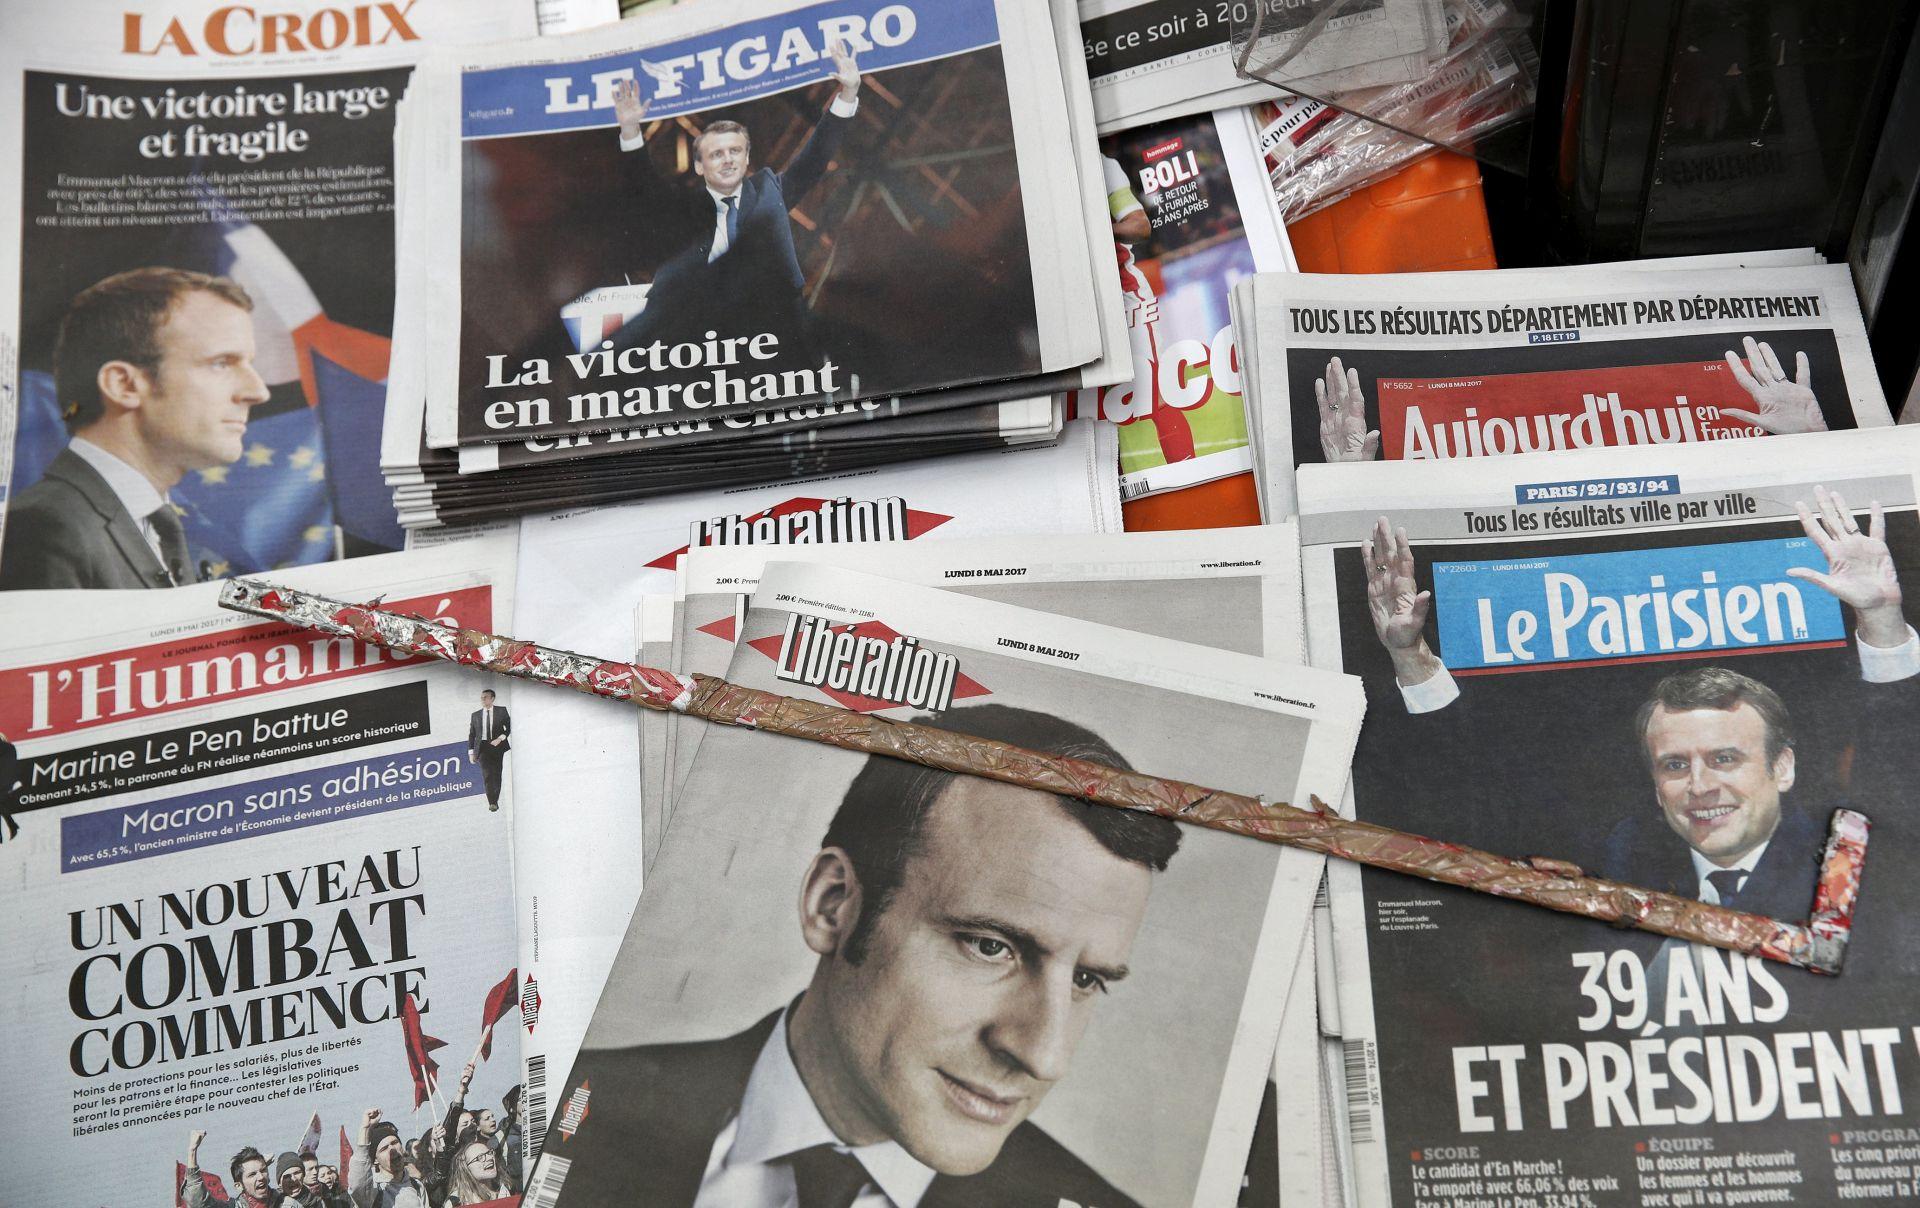 Macron otvoren za razgovore s konzervativcima